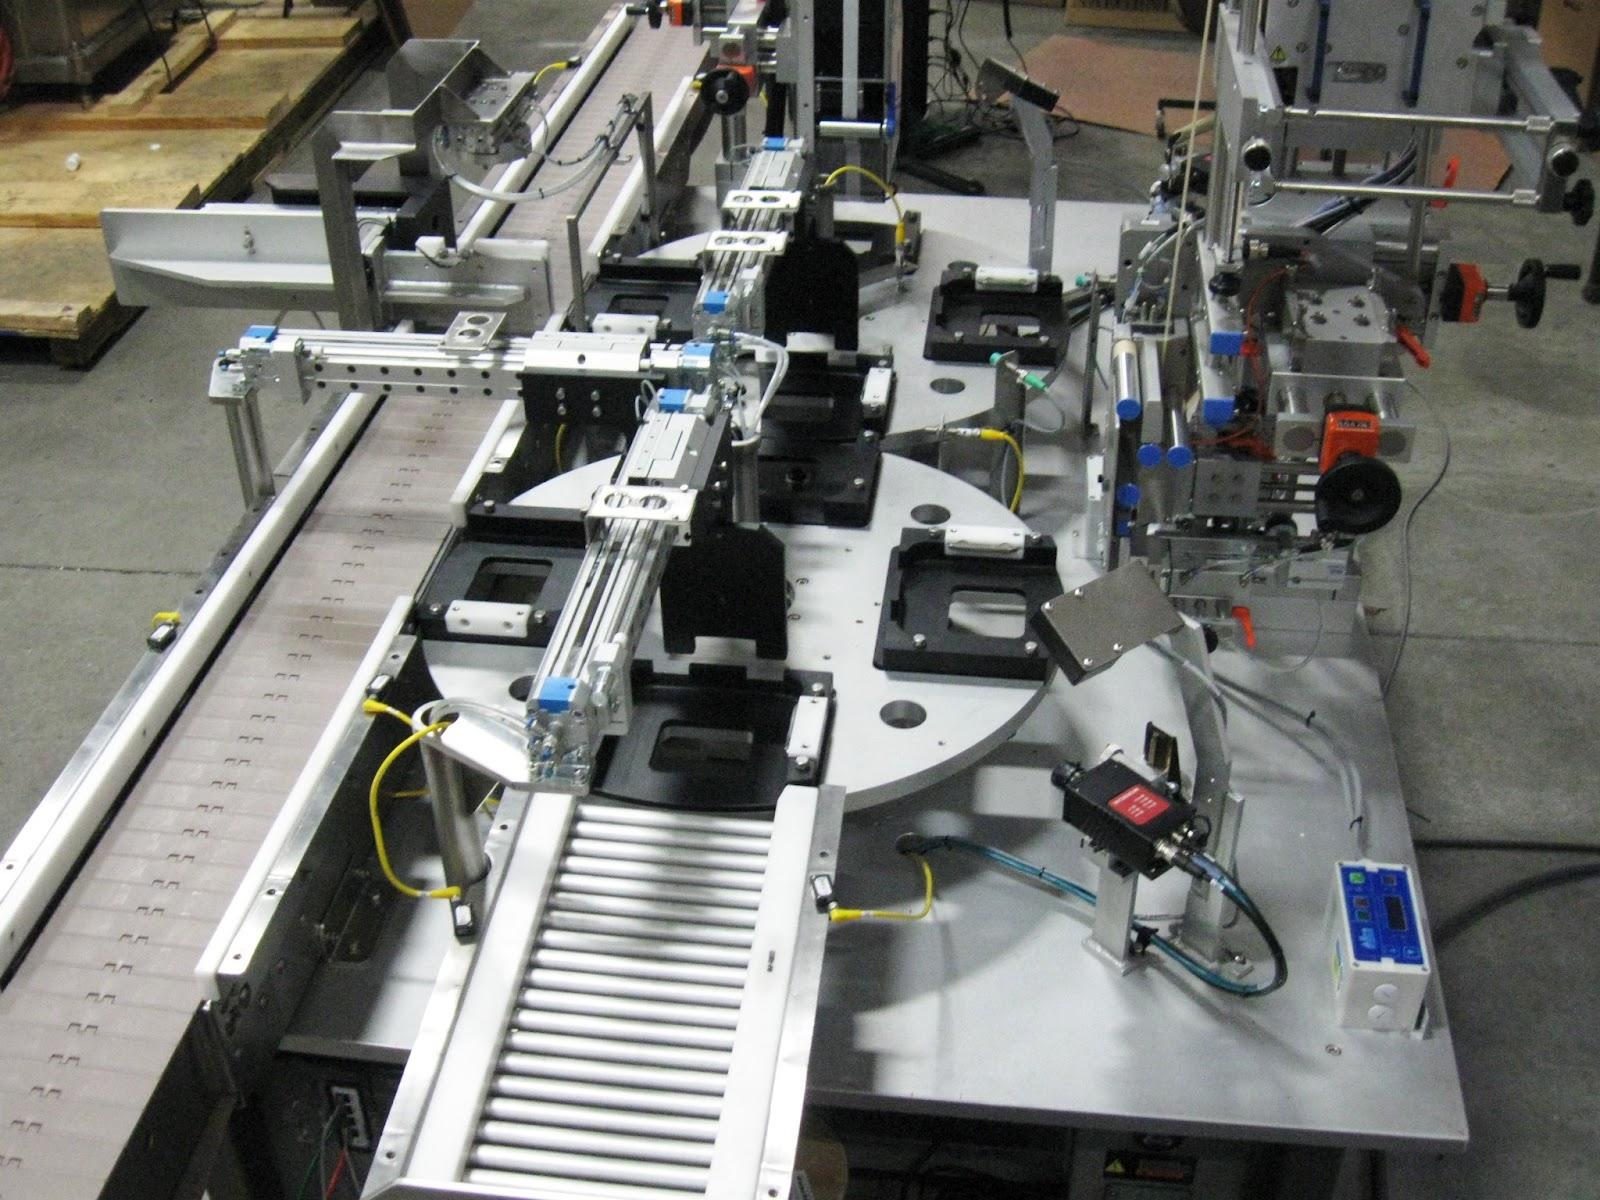 INDUSTRIAL AUTOMATION ~ Phantom Technologies | 1600 x 1200 jpeg 362kB